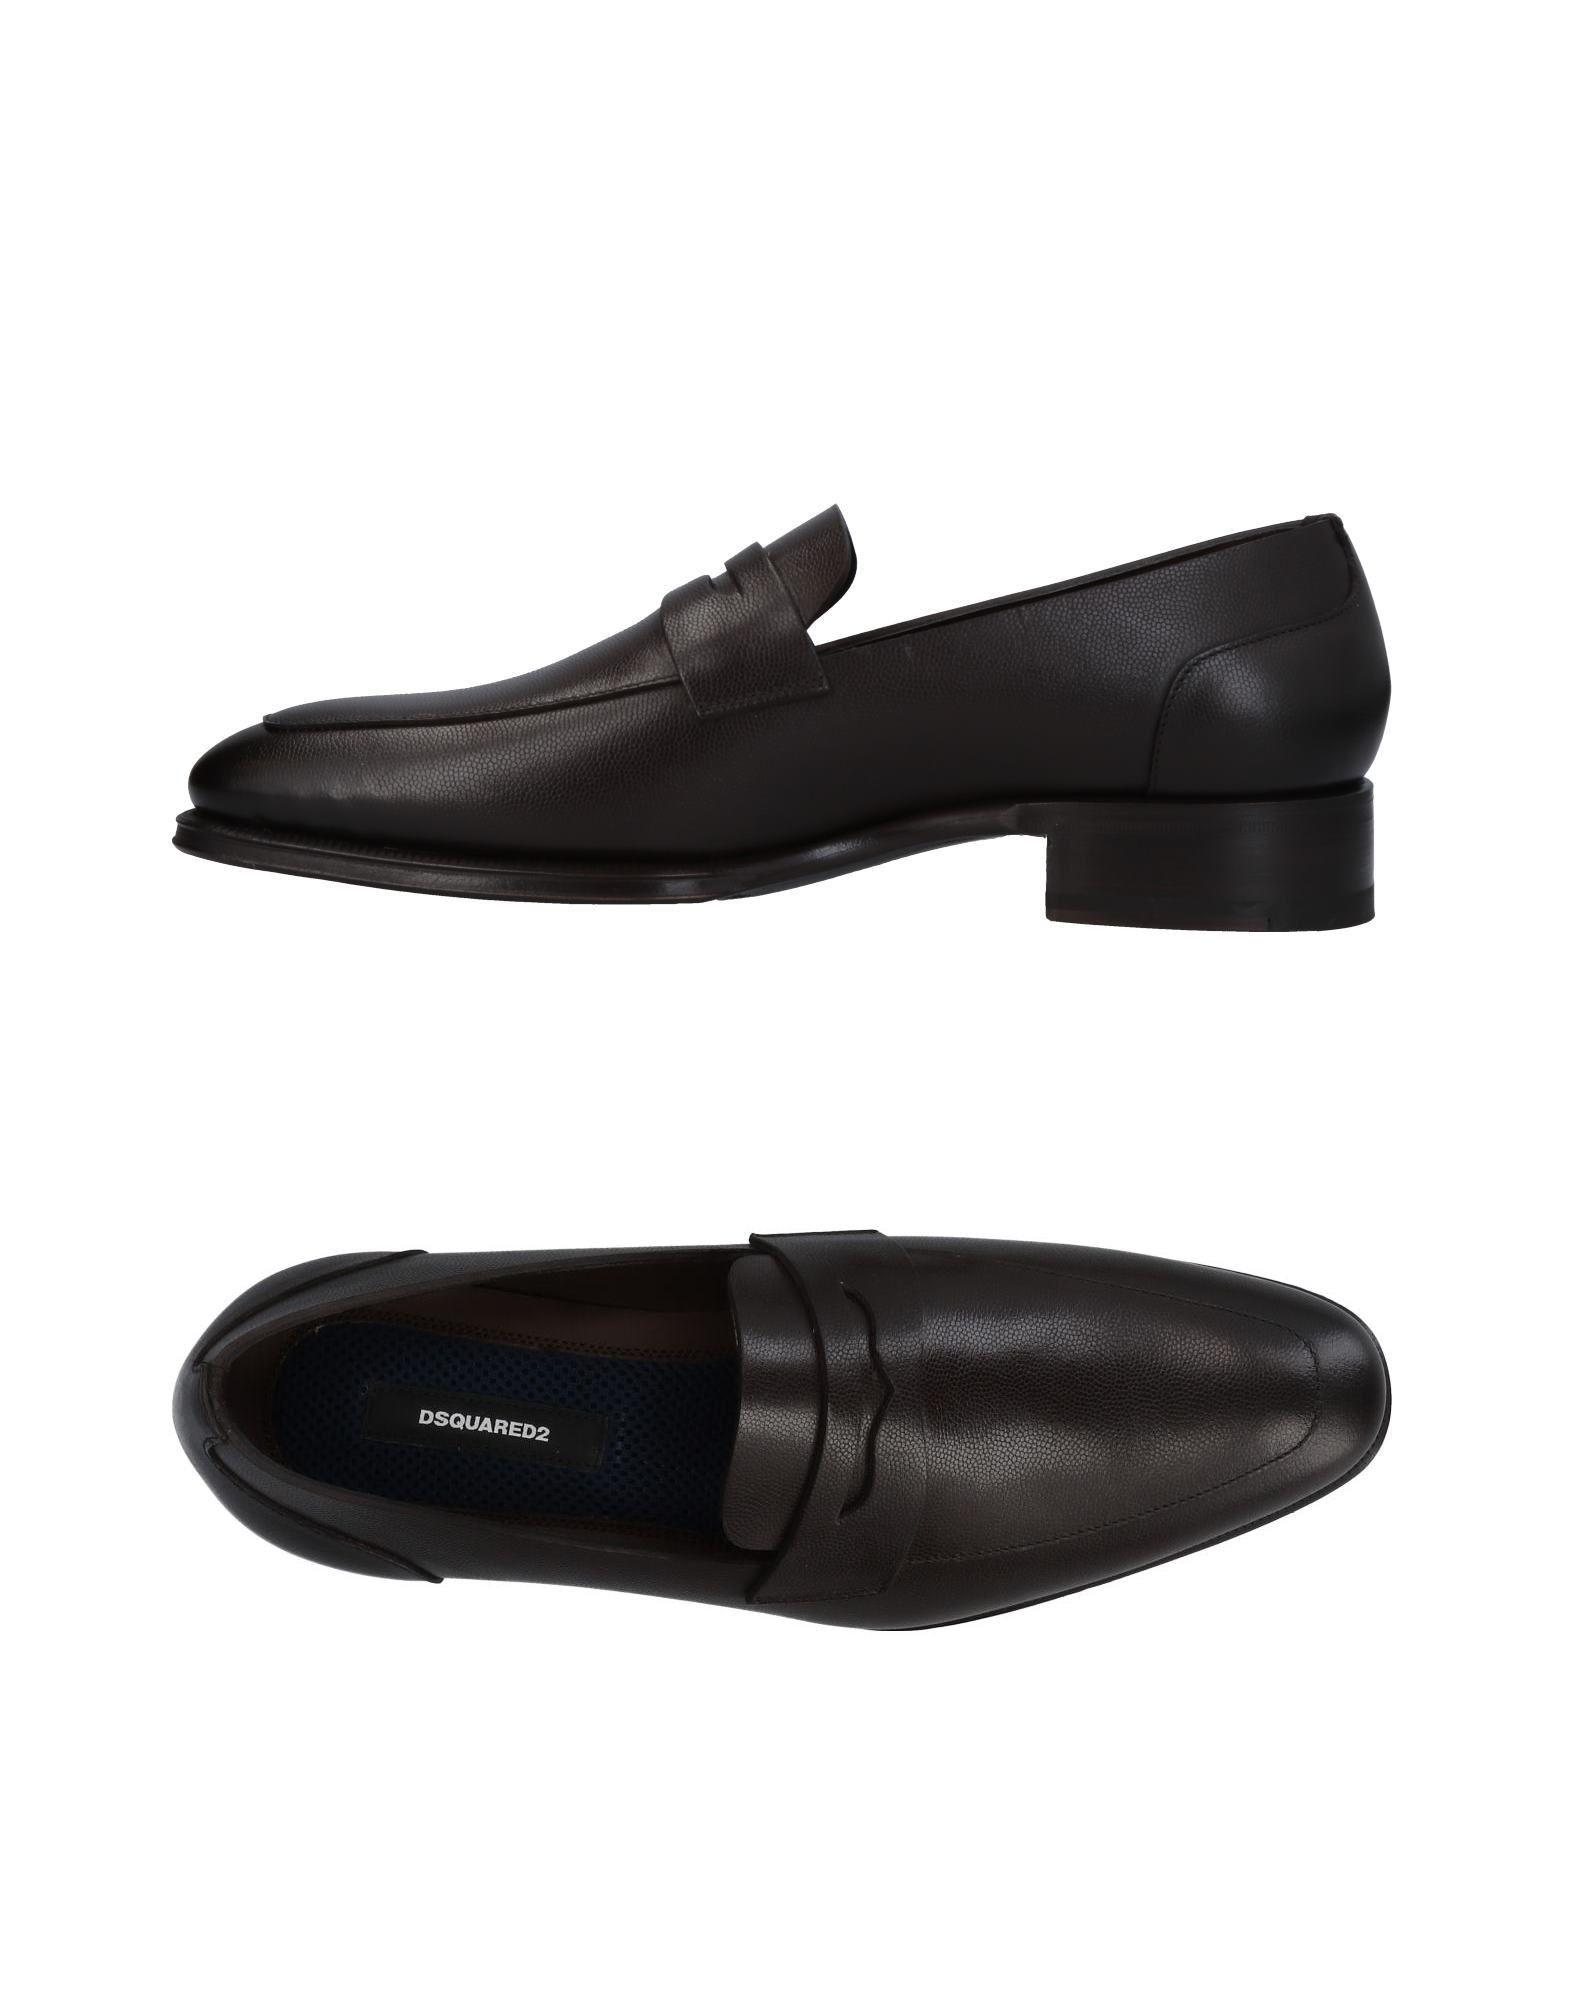 Dsquared2 Mokassins Herren  11428795FE Gute Qualität beliebte Schuhe